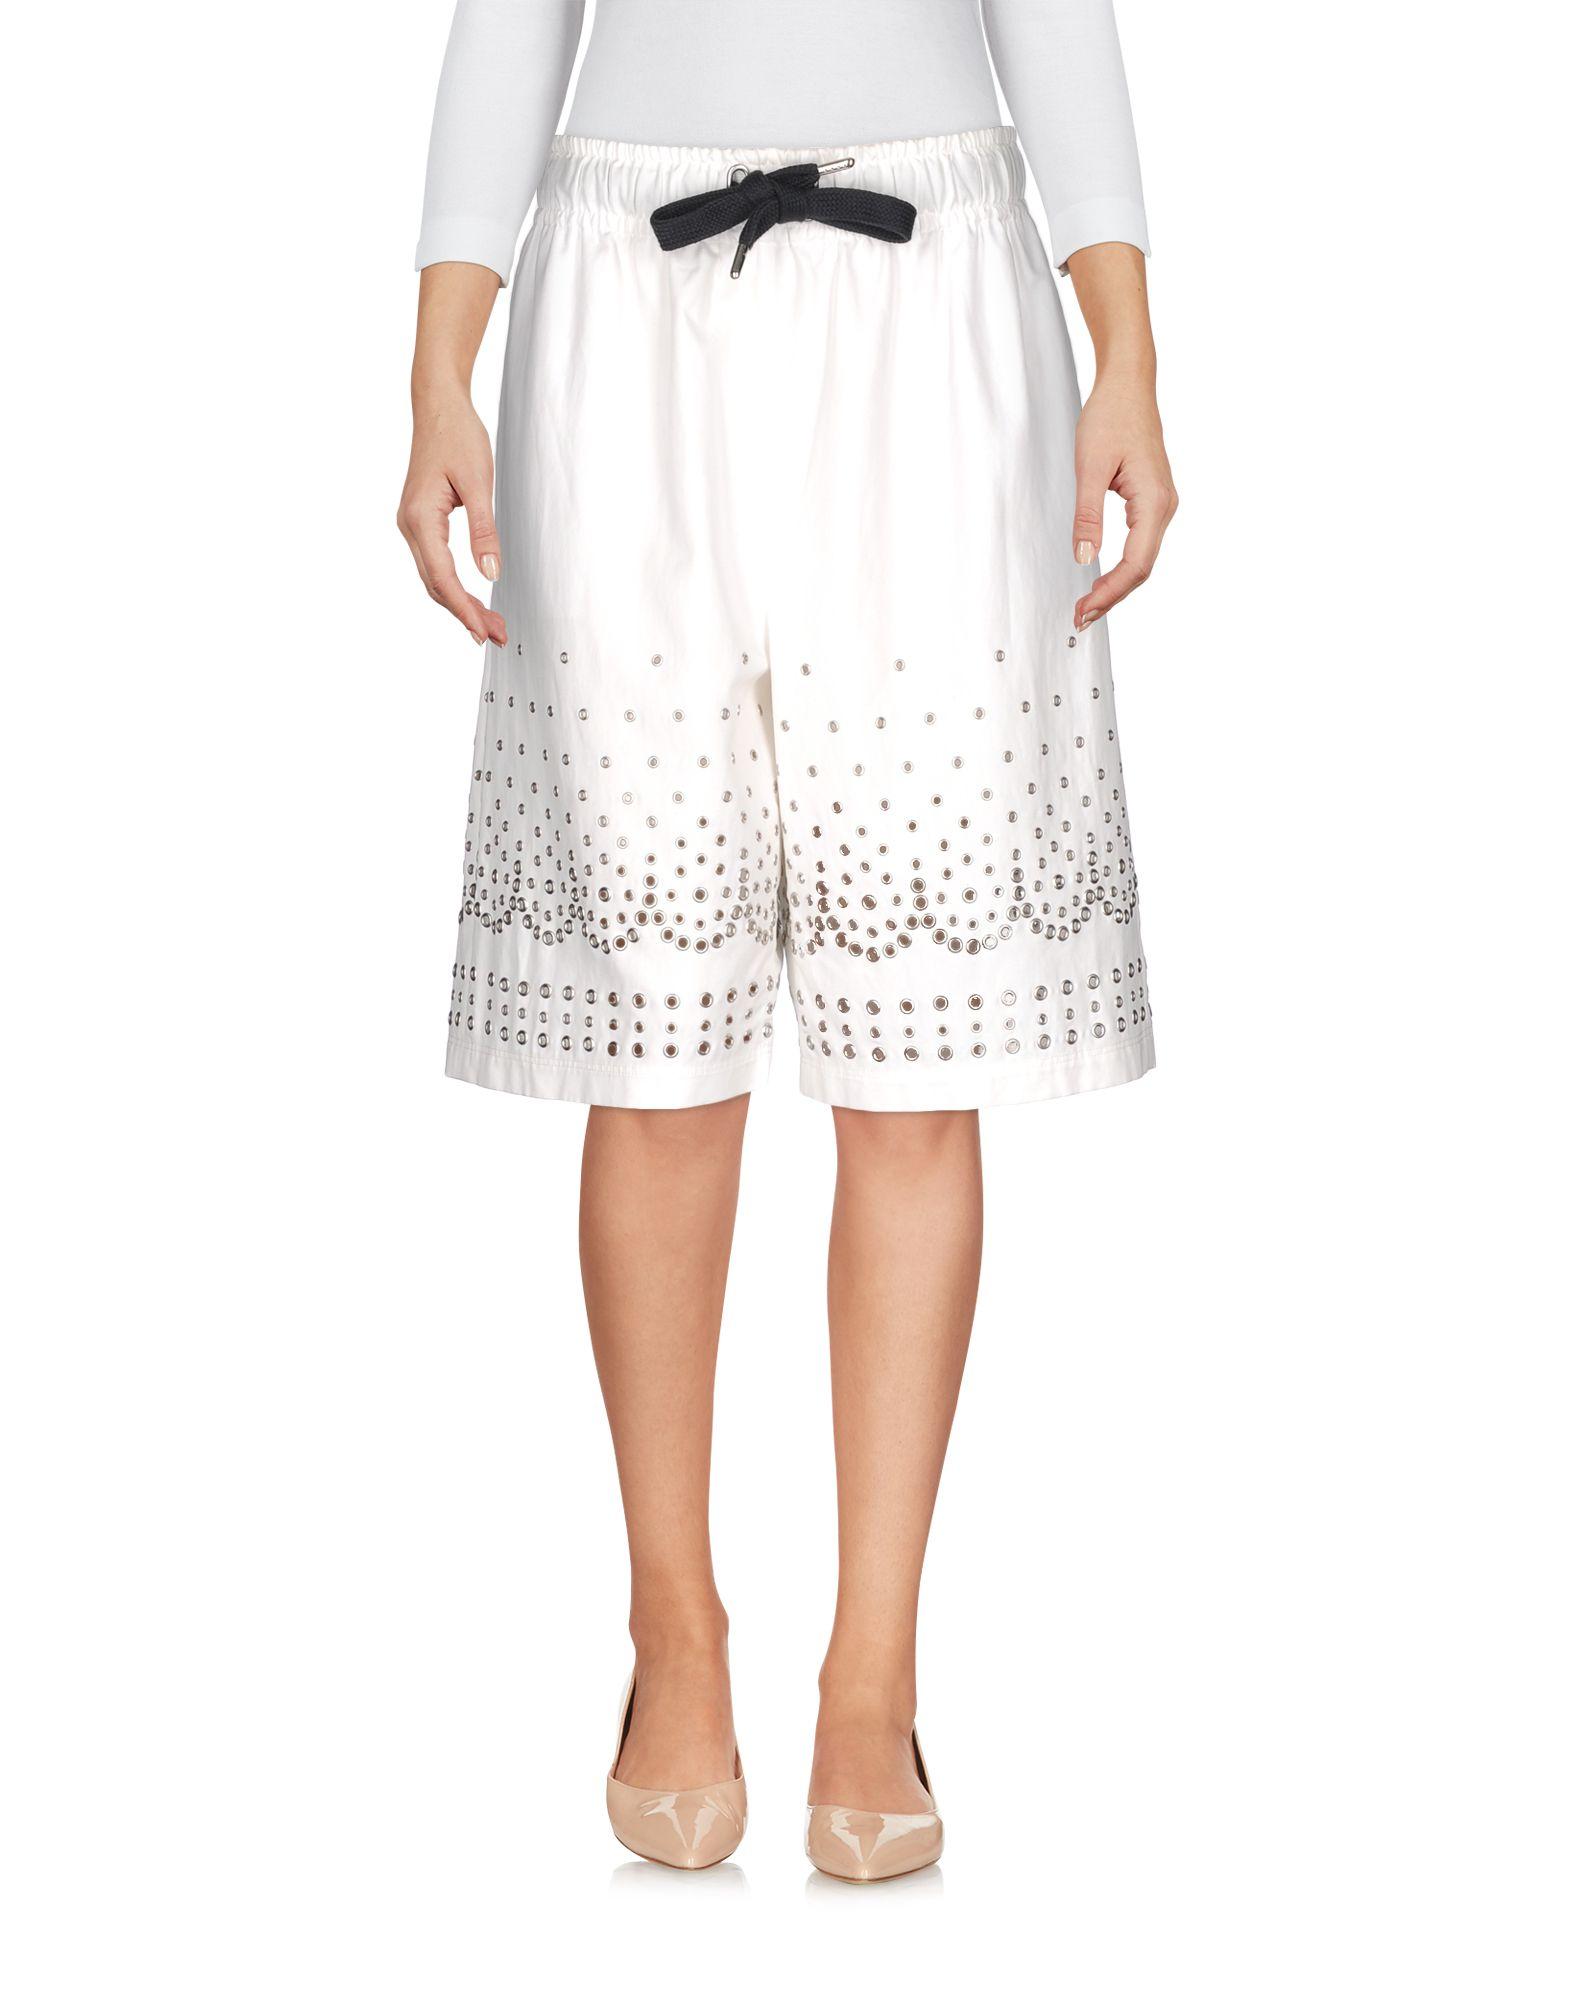 ALEXANDER WANG Damen Bermudashorts Farbe Weiß Größe 3 - broschei